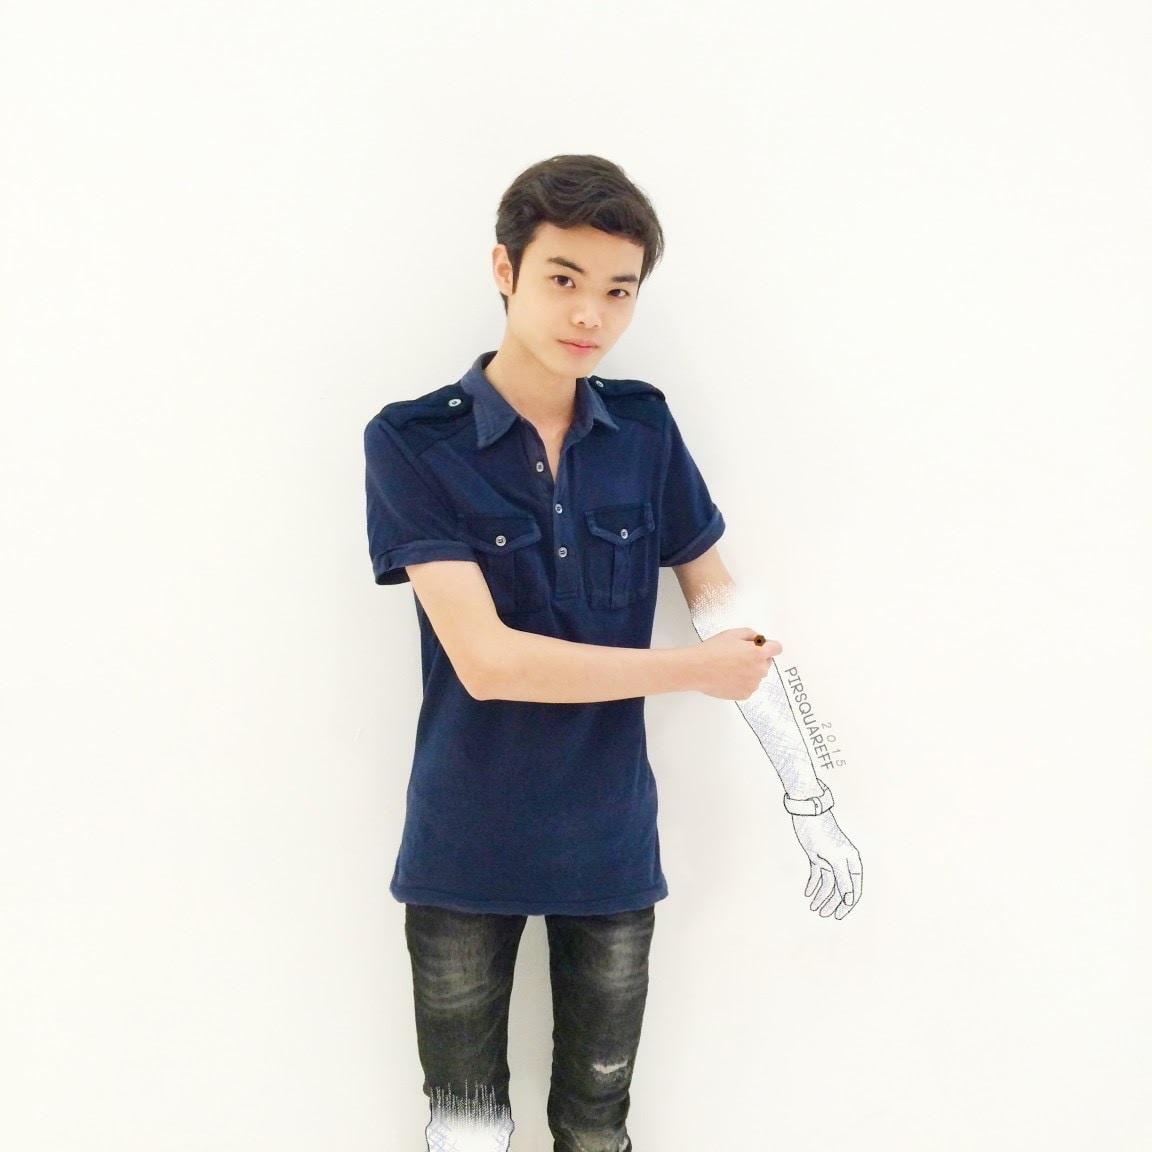 Go to Parinthorn Saithong's profile